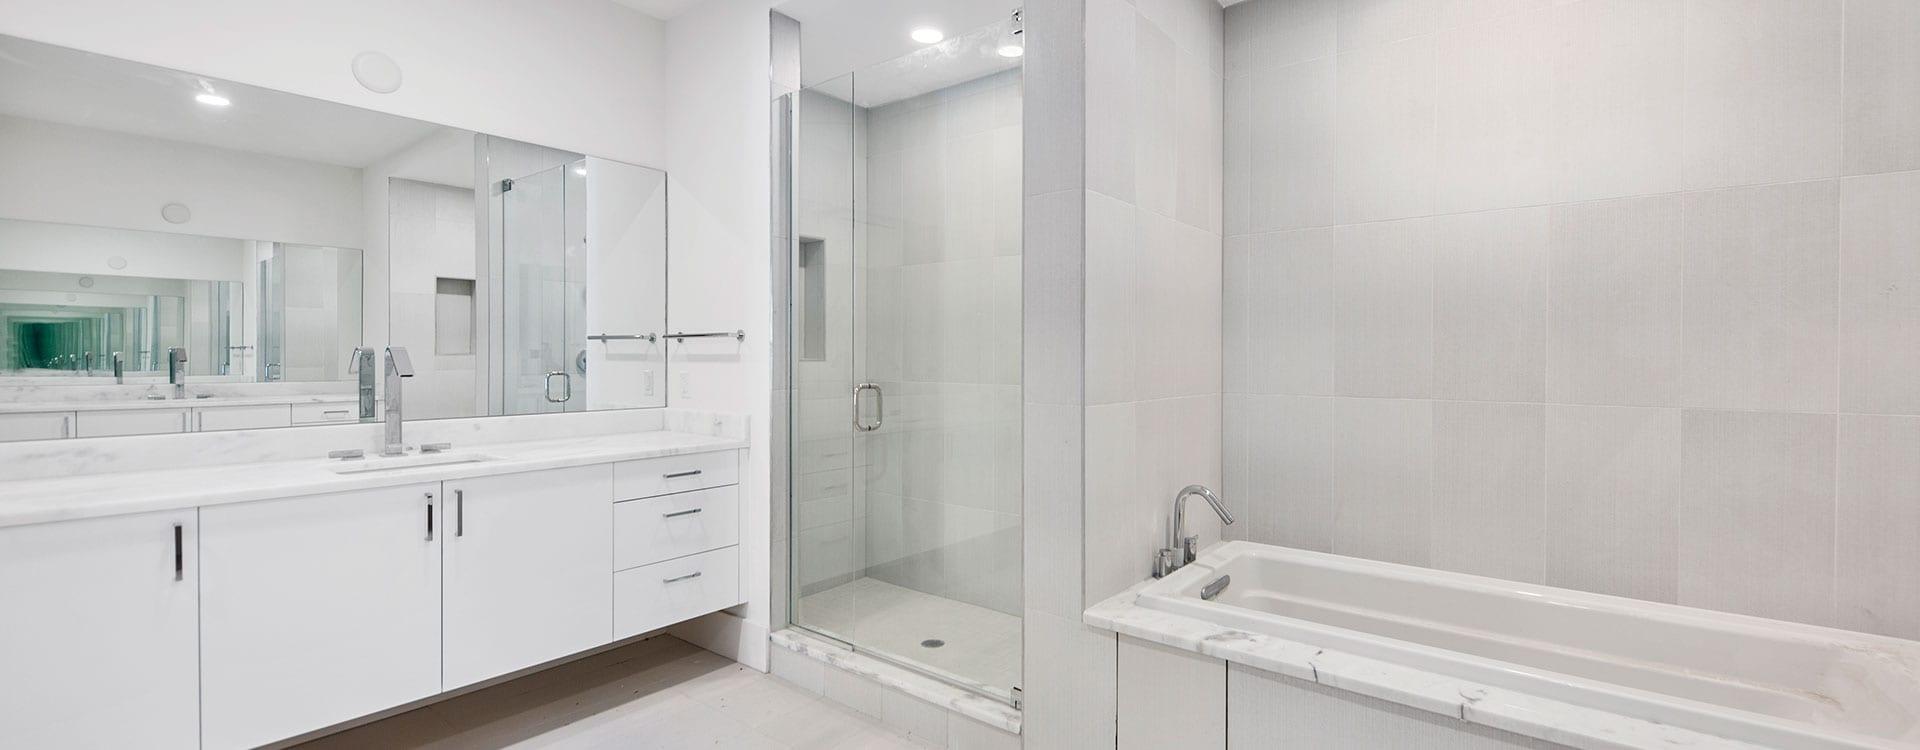 BLVD Sarasota Residence 1102 bathroom